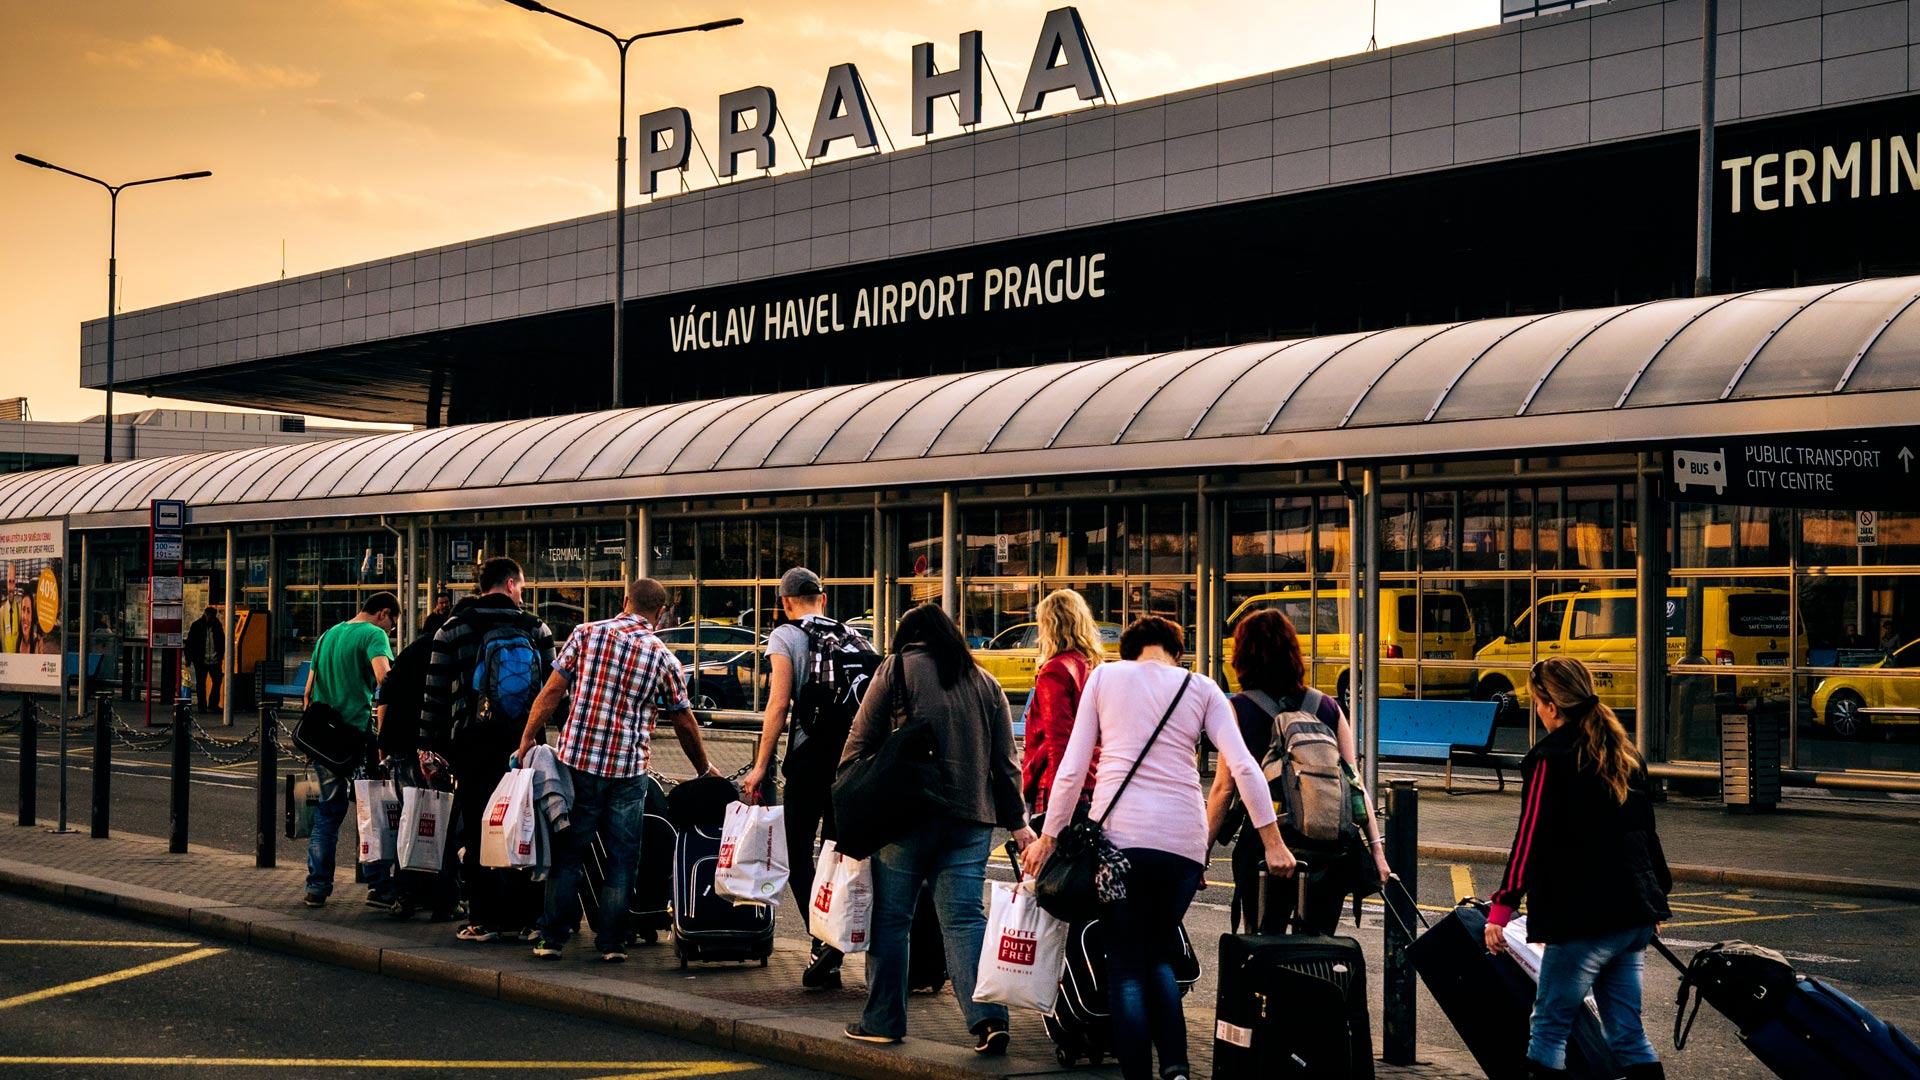 Praga – jak dojechać z lotniska do centrum? 4 sposoby